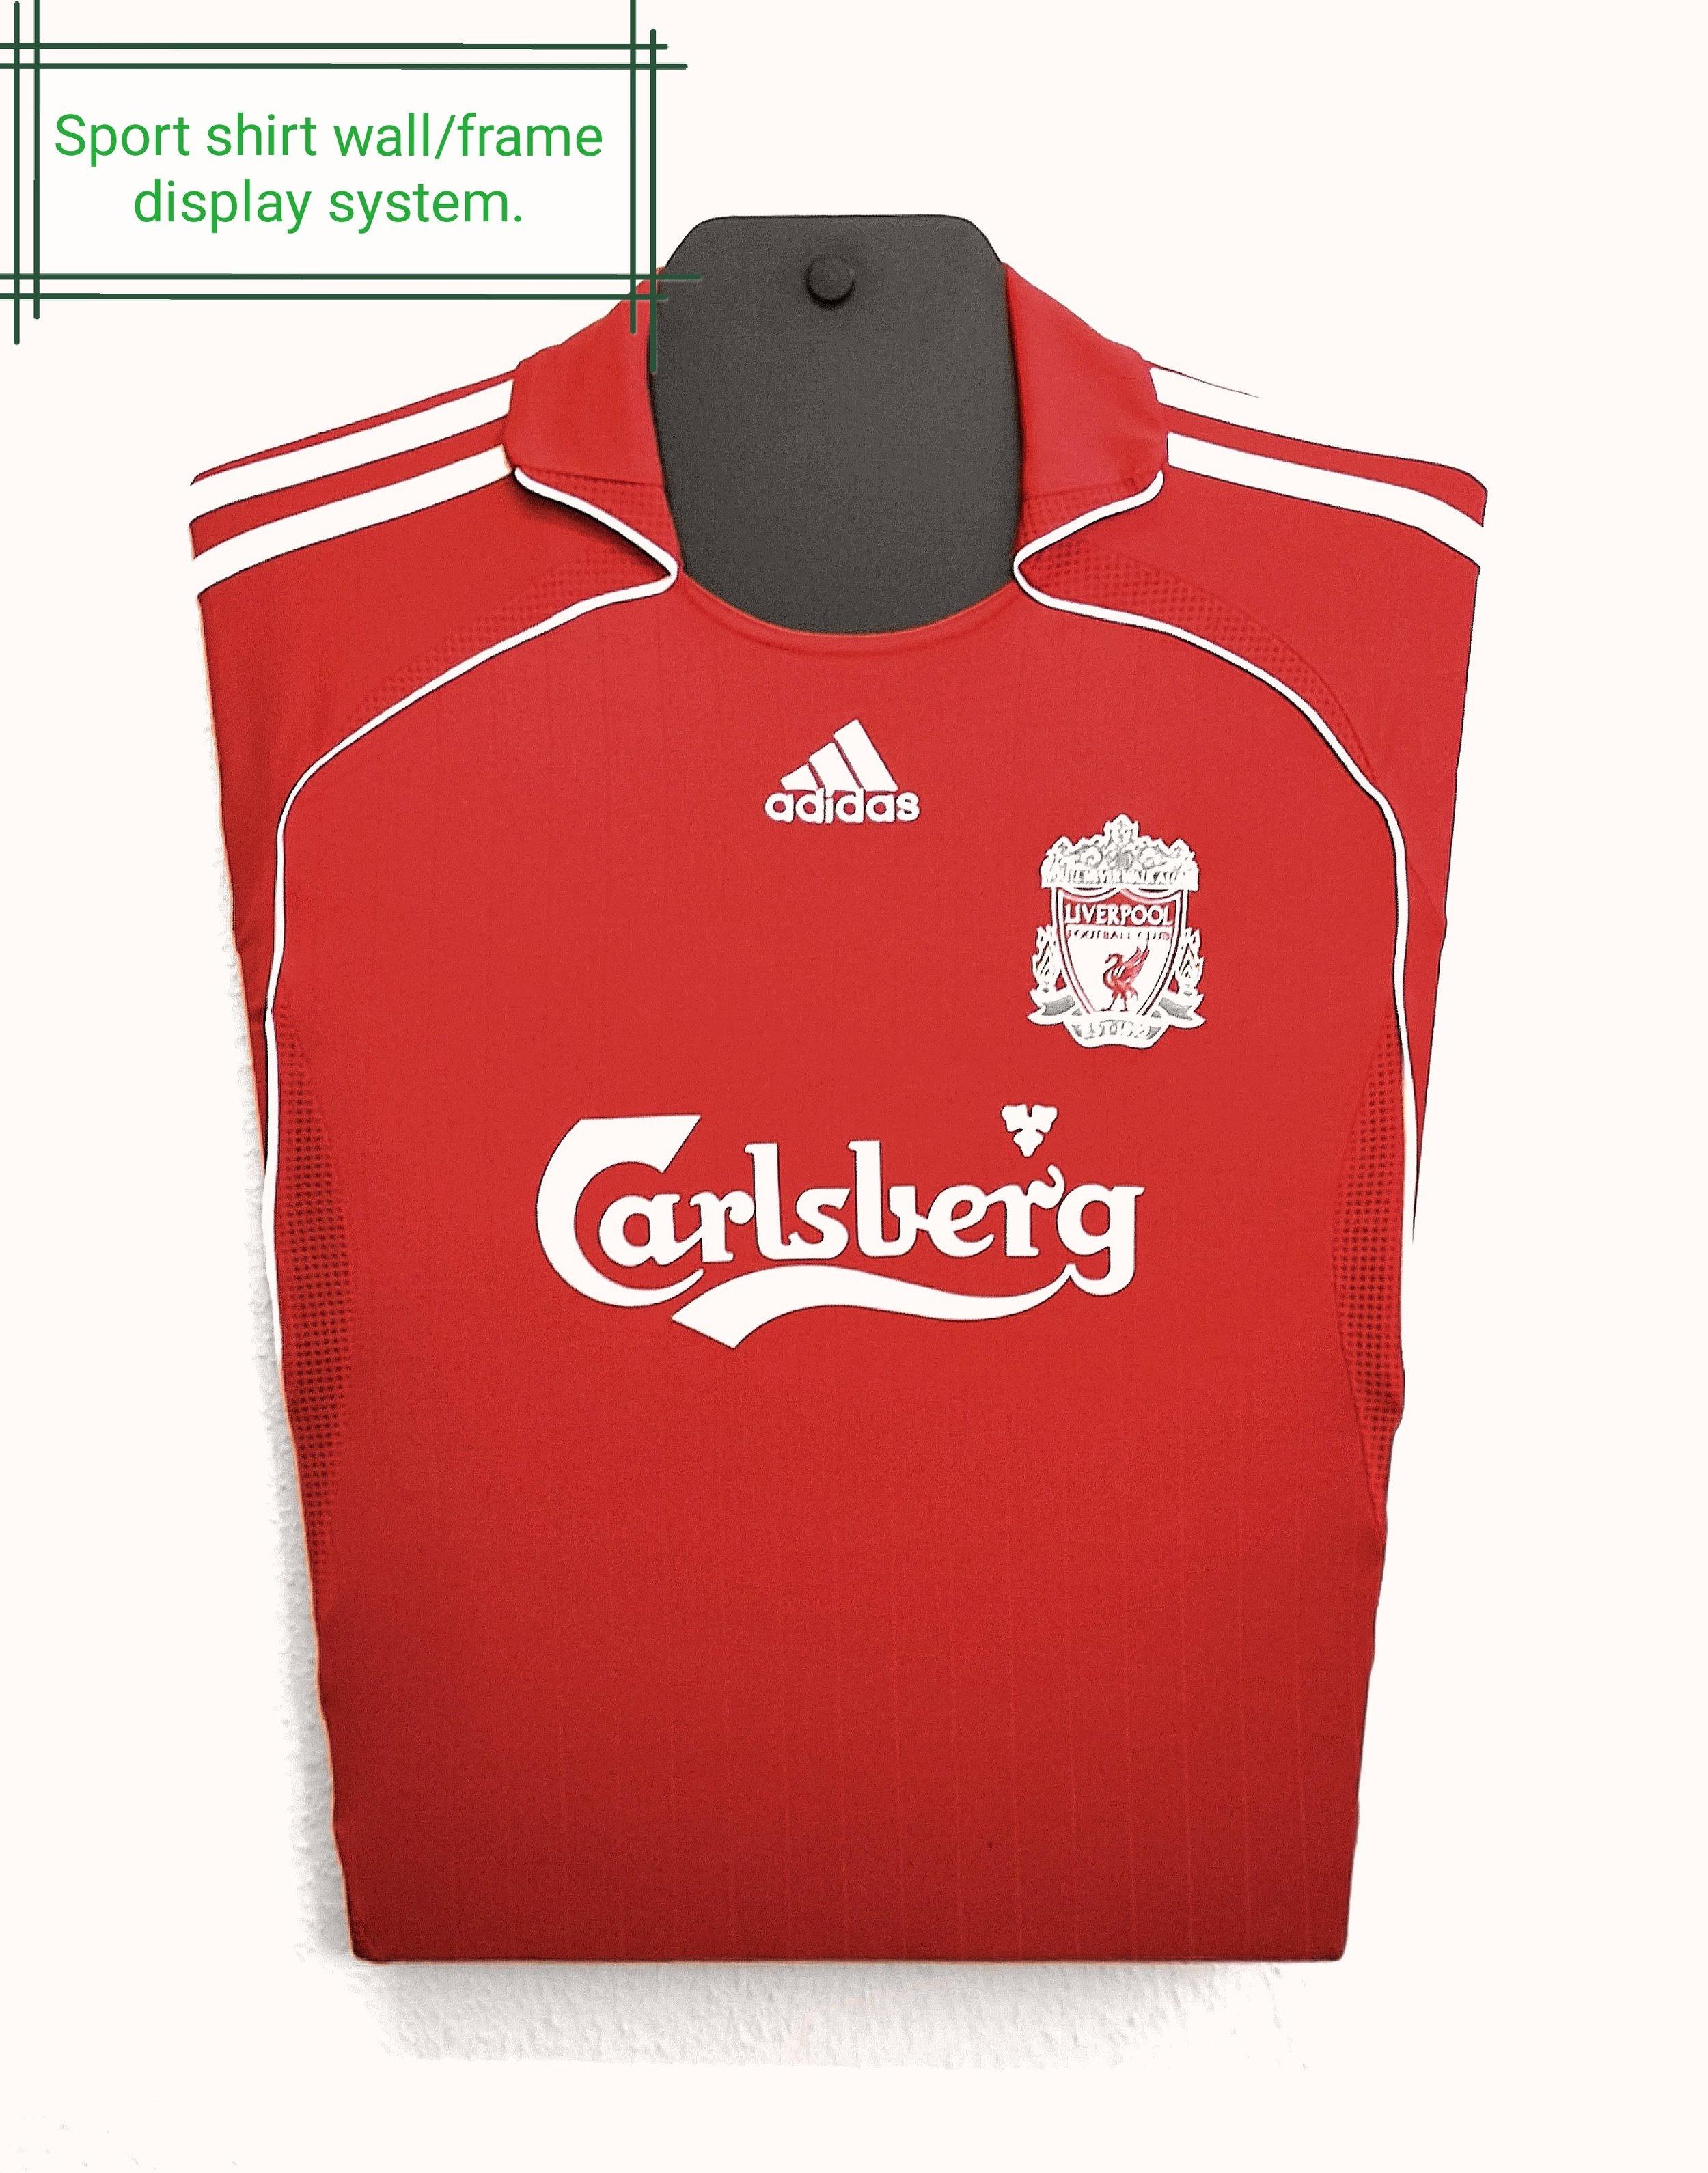 liverpool football shirt carlsberg